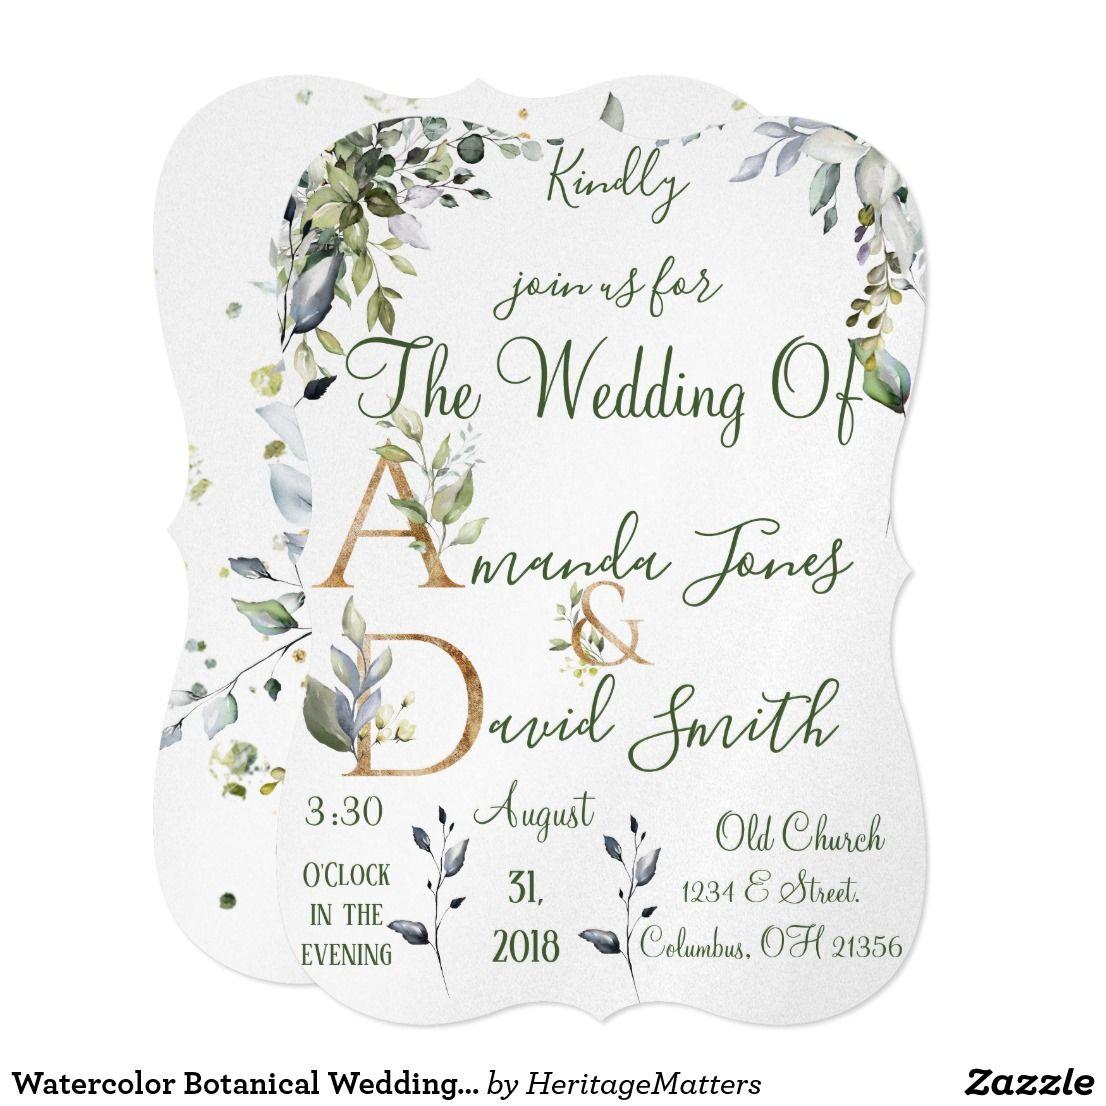 Watercolor Botanical Wedding Invitation